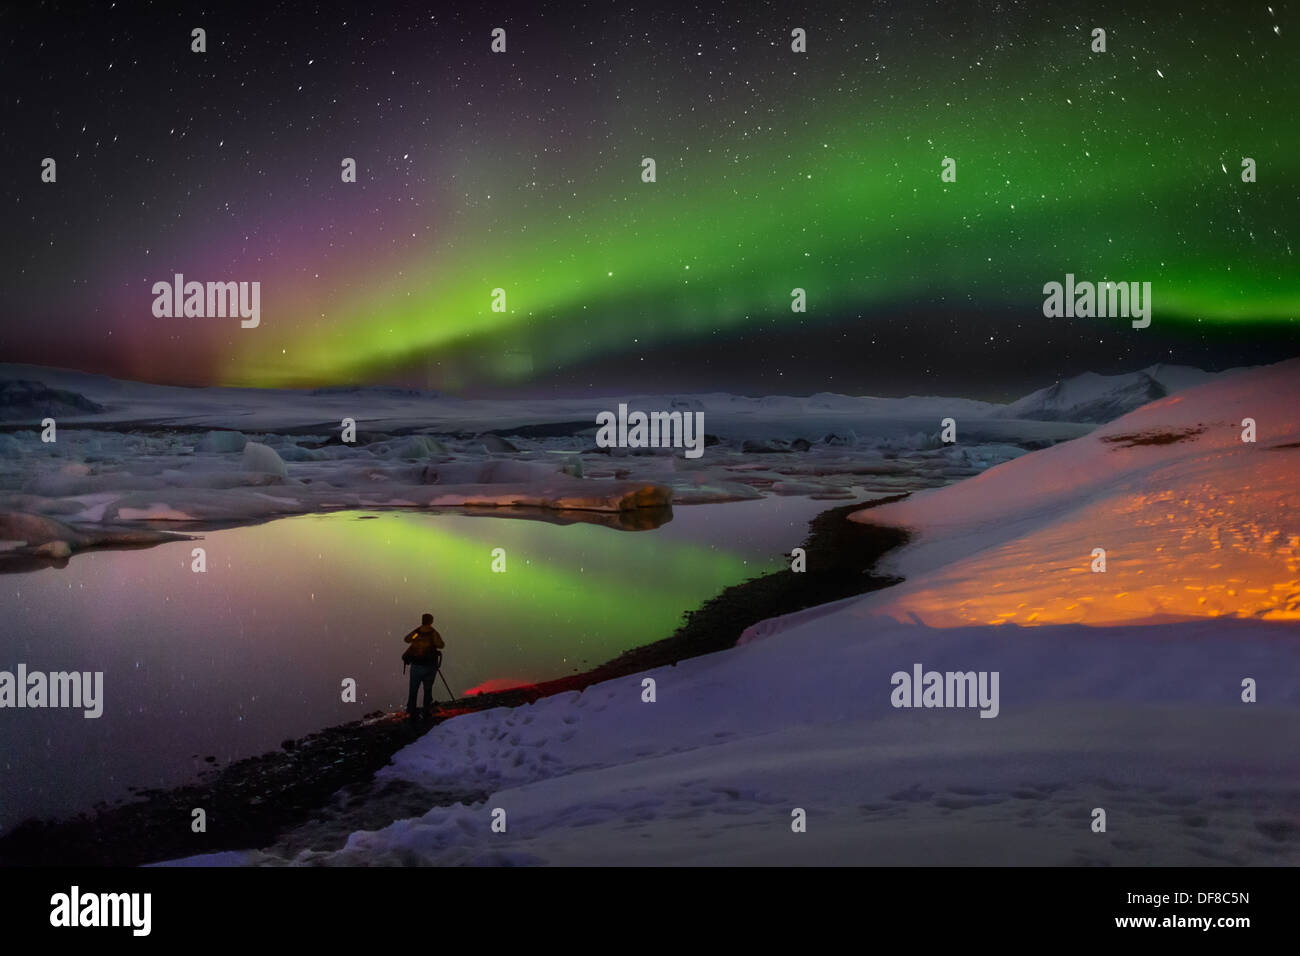 La prise de photos d'aurores boréales au Jokulsarlon, Breidarmerkurjokull Vatnajokull, glacière, à l'Islande. Photo Stock